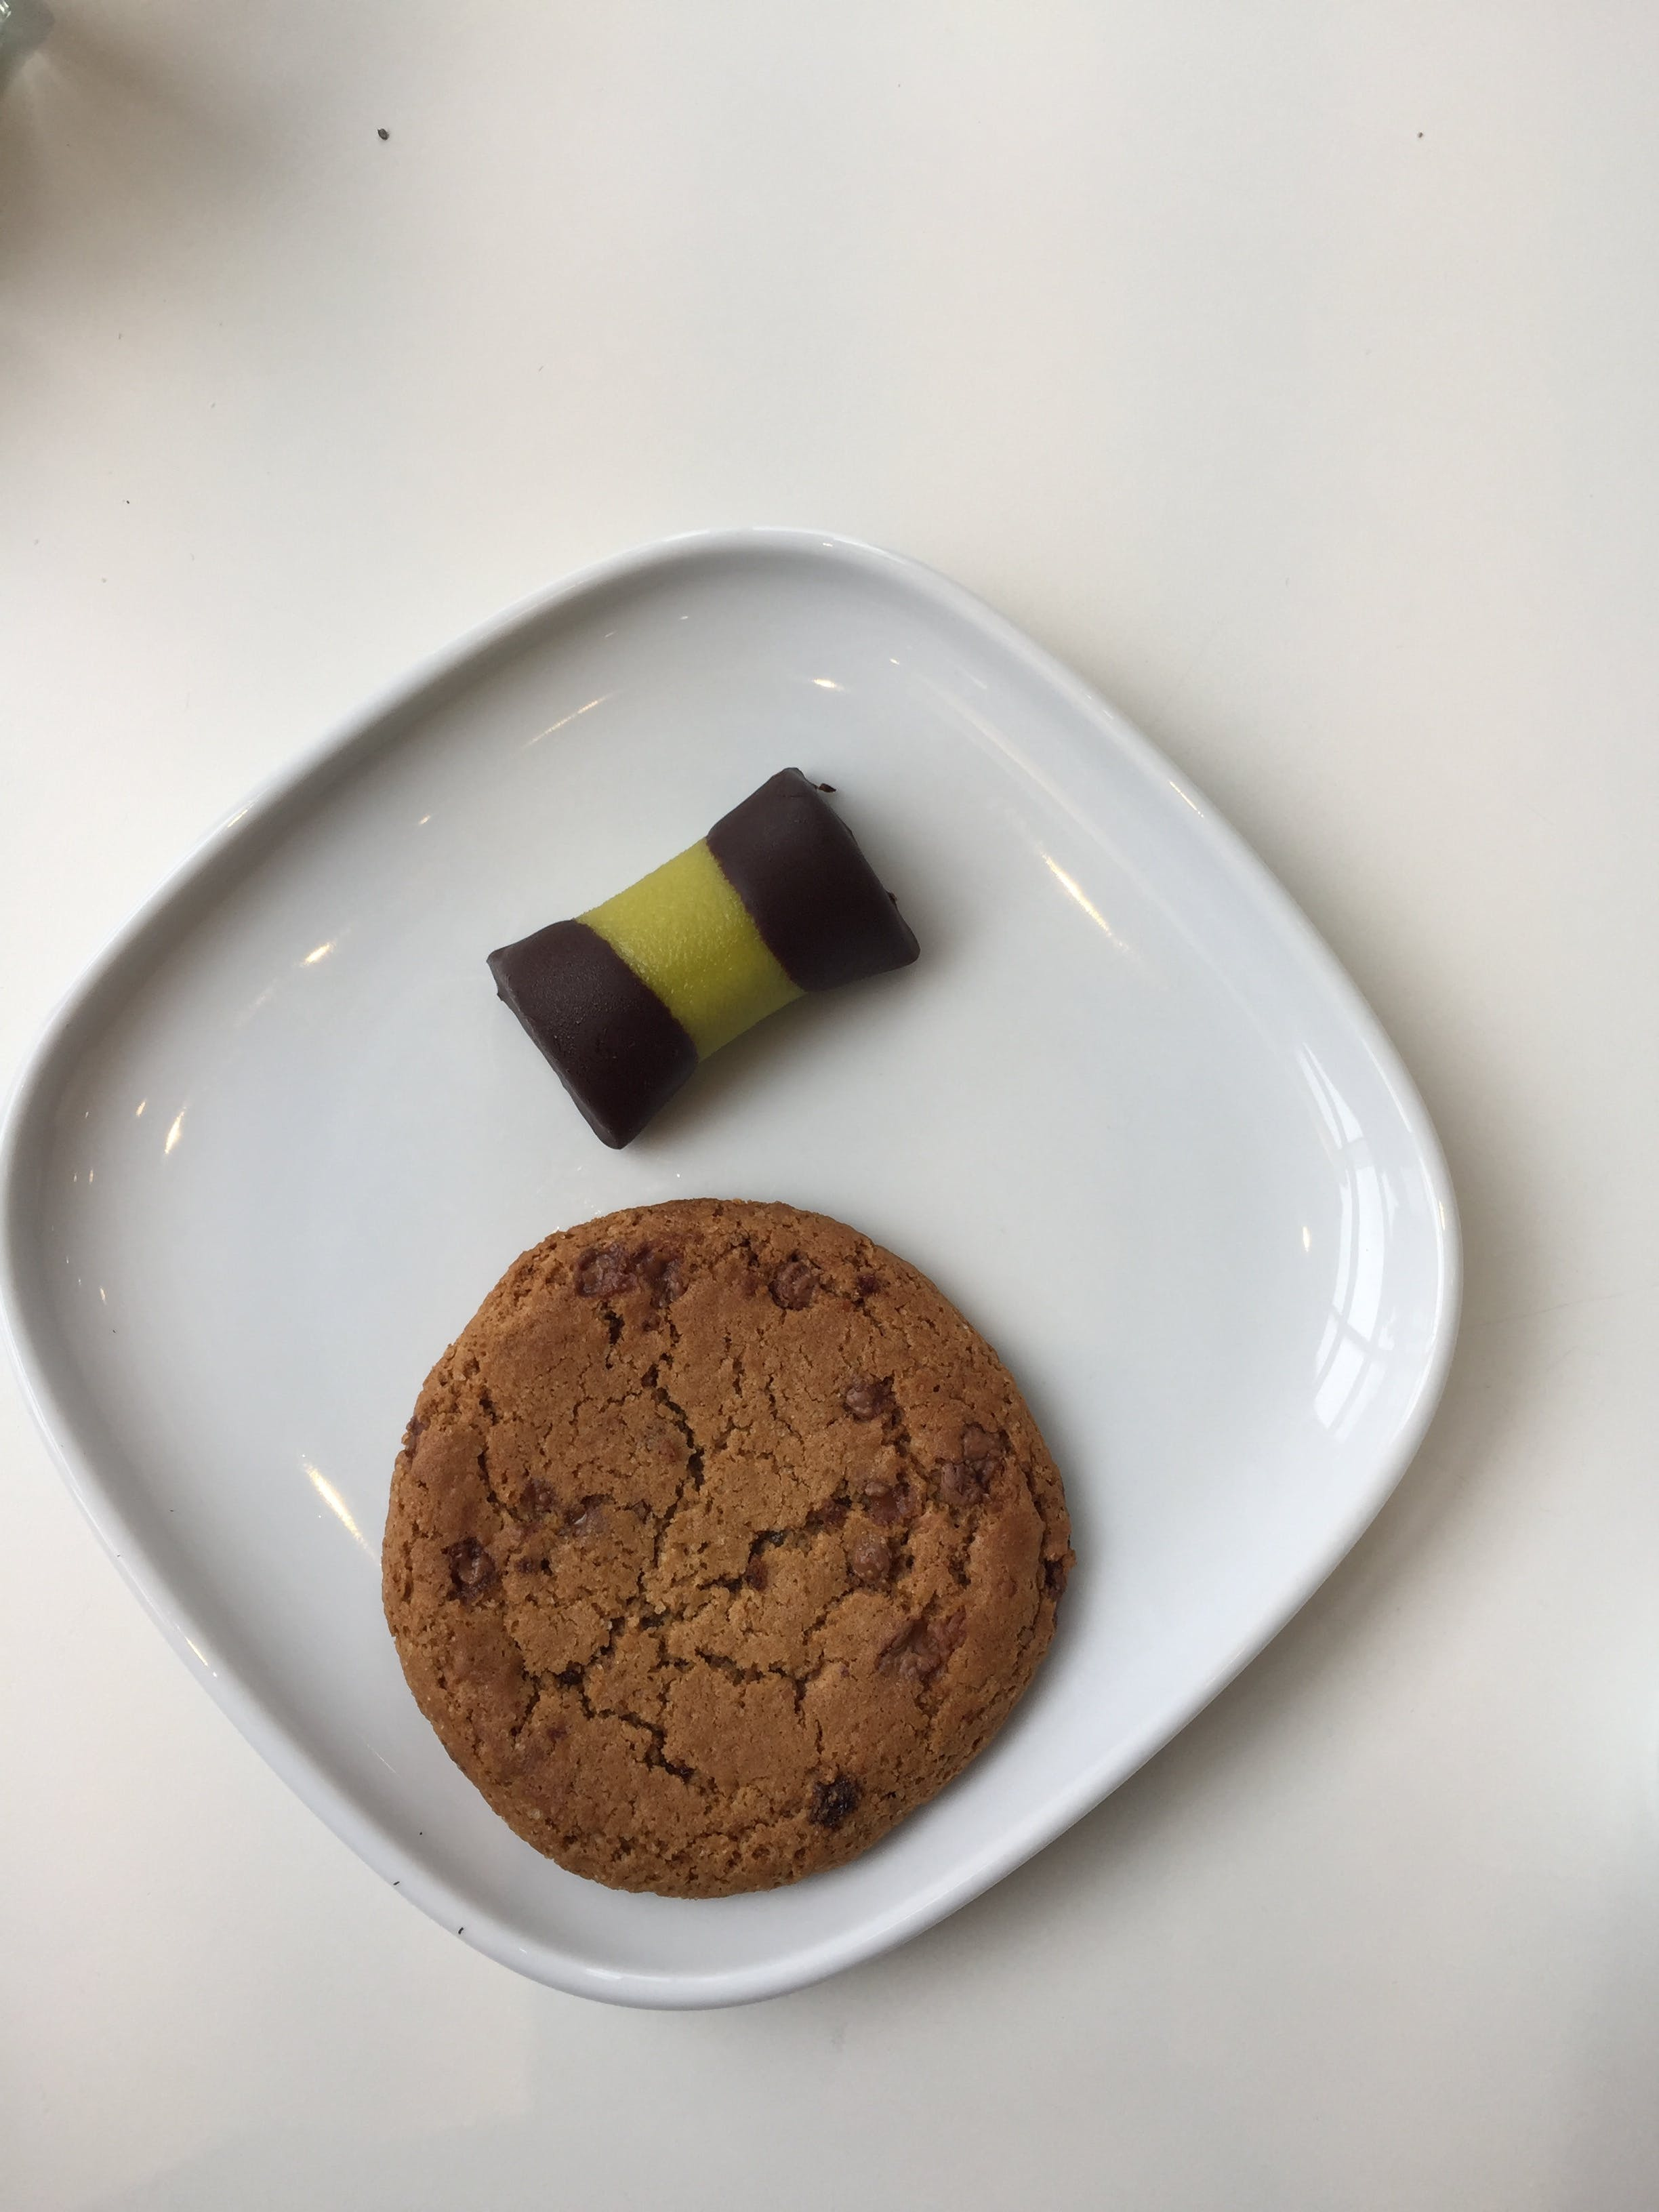 Free stock photo of food, dessert, cookie, minimal